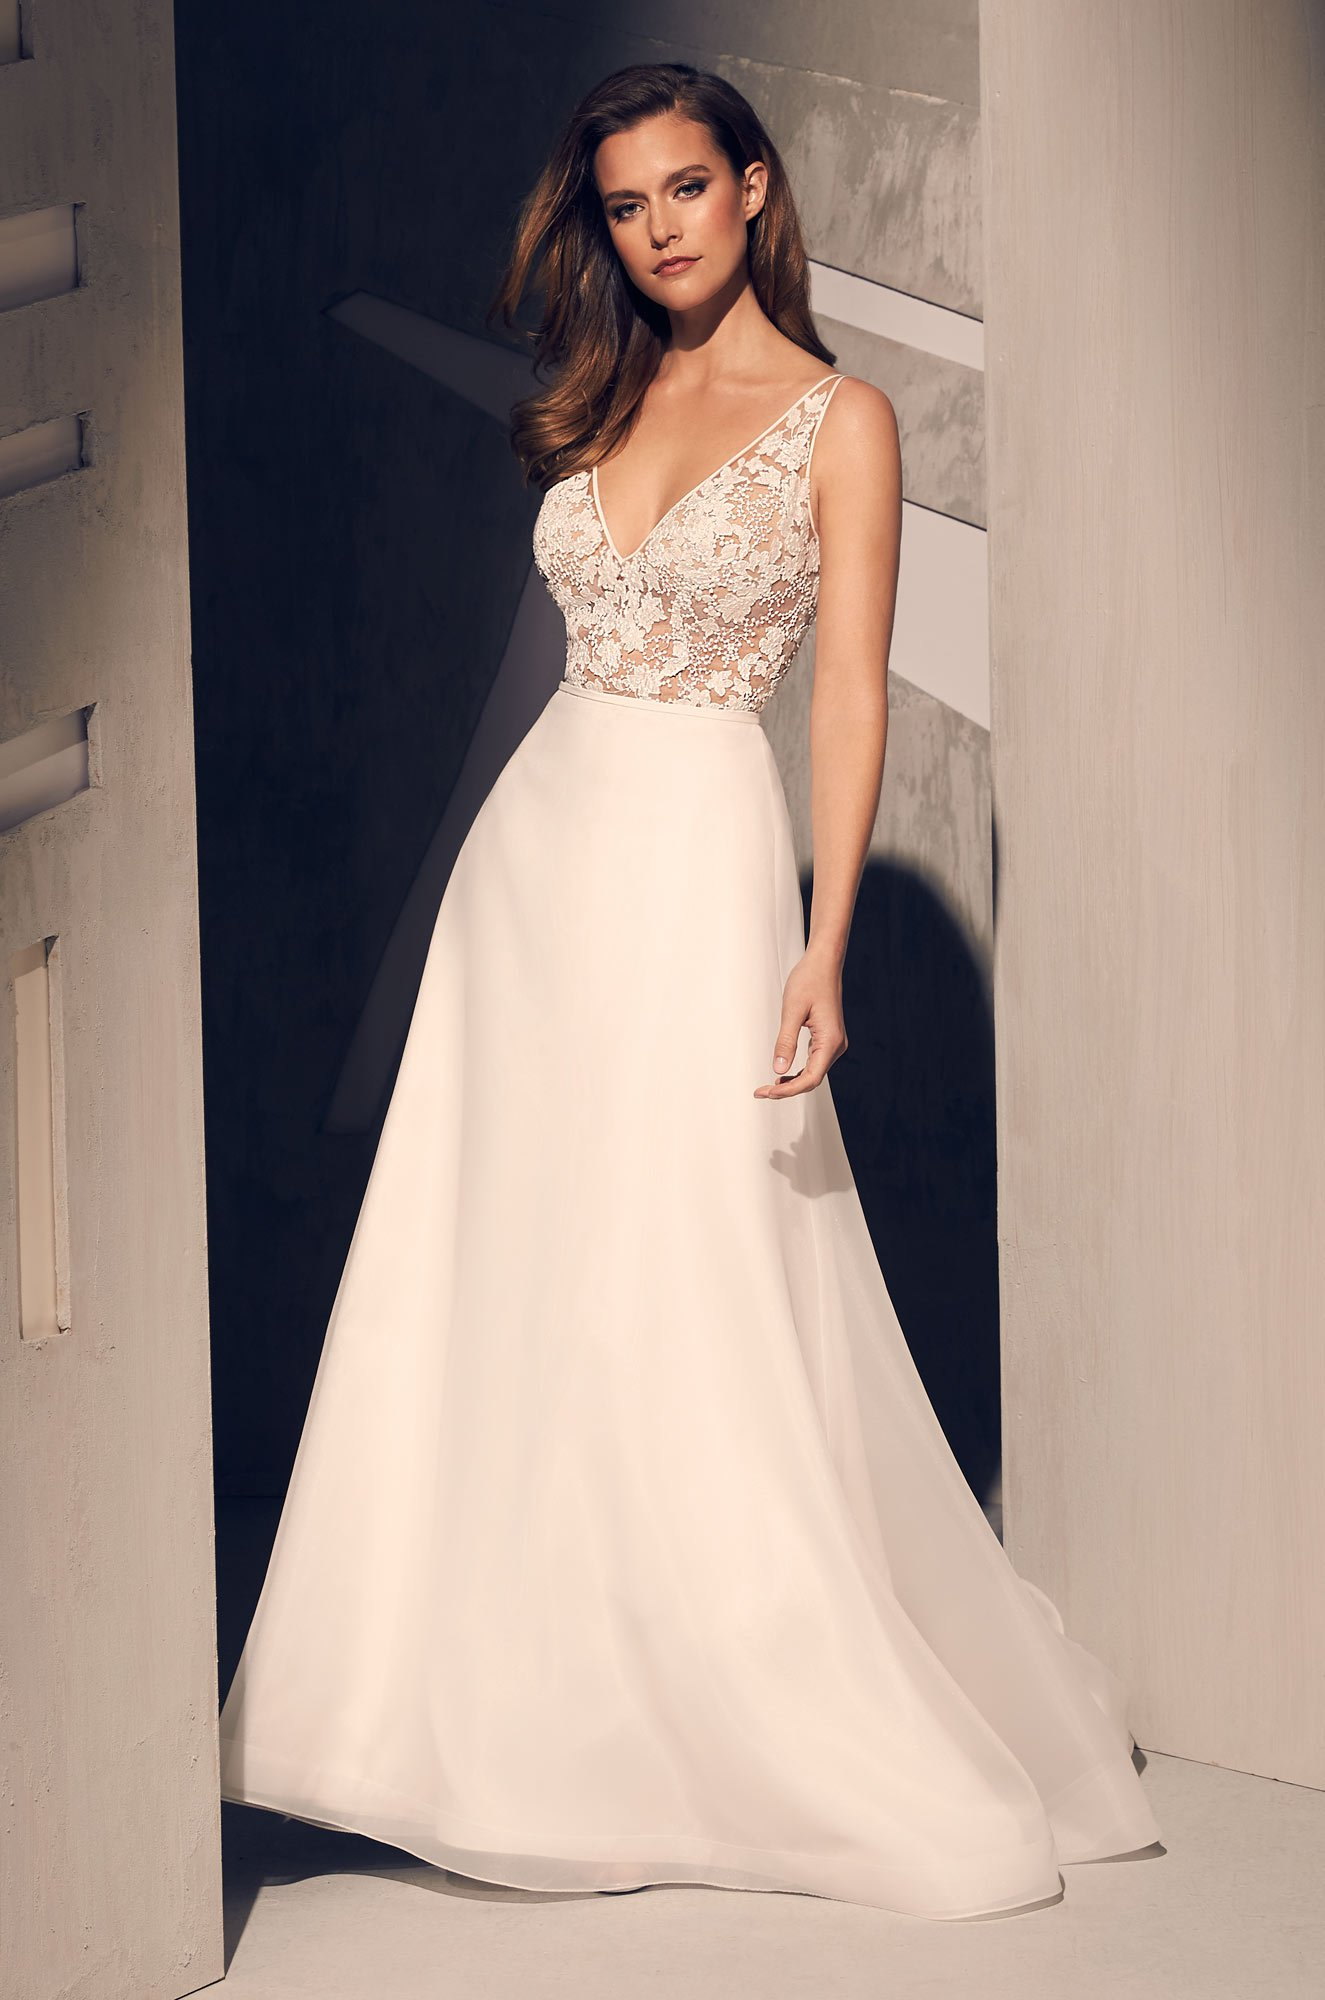 Sheer Sequin Lace Wedding Dress - Style #2210 | Mikaella Bridal